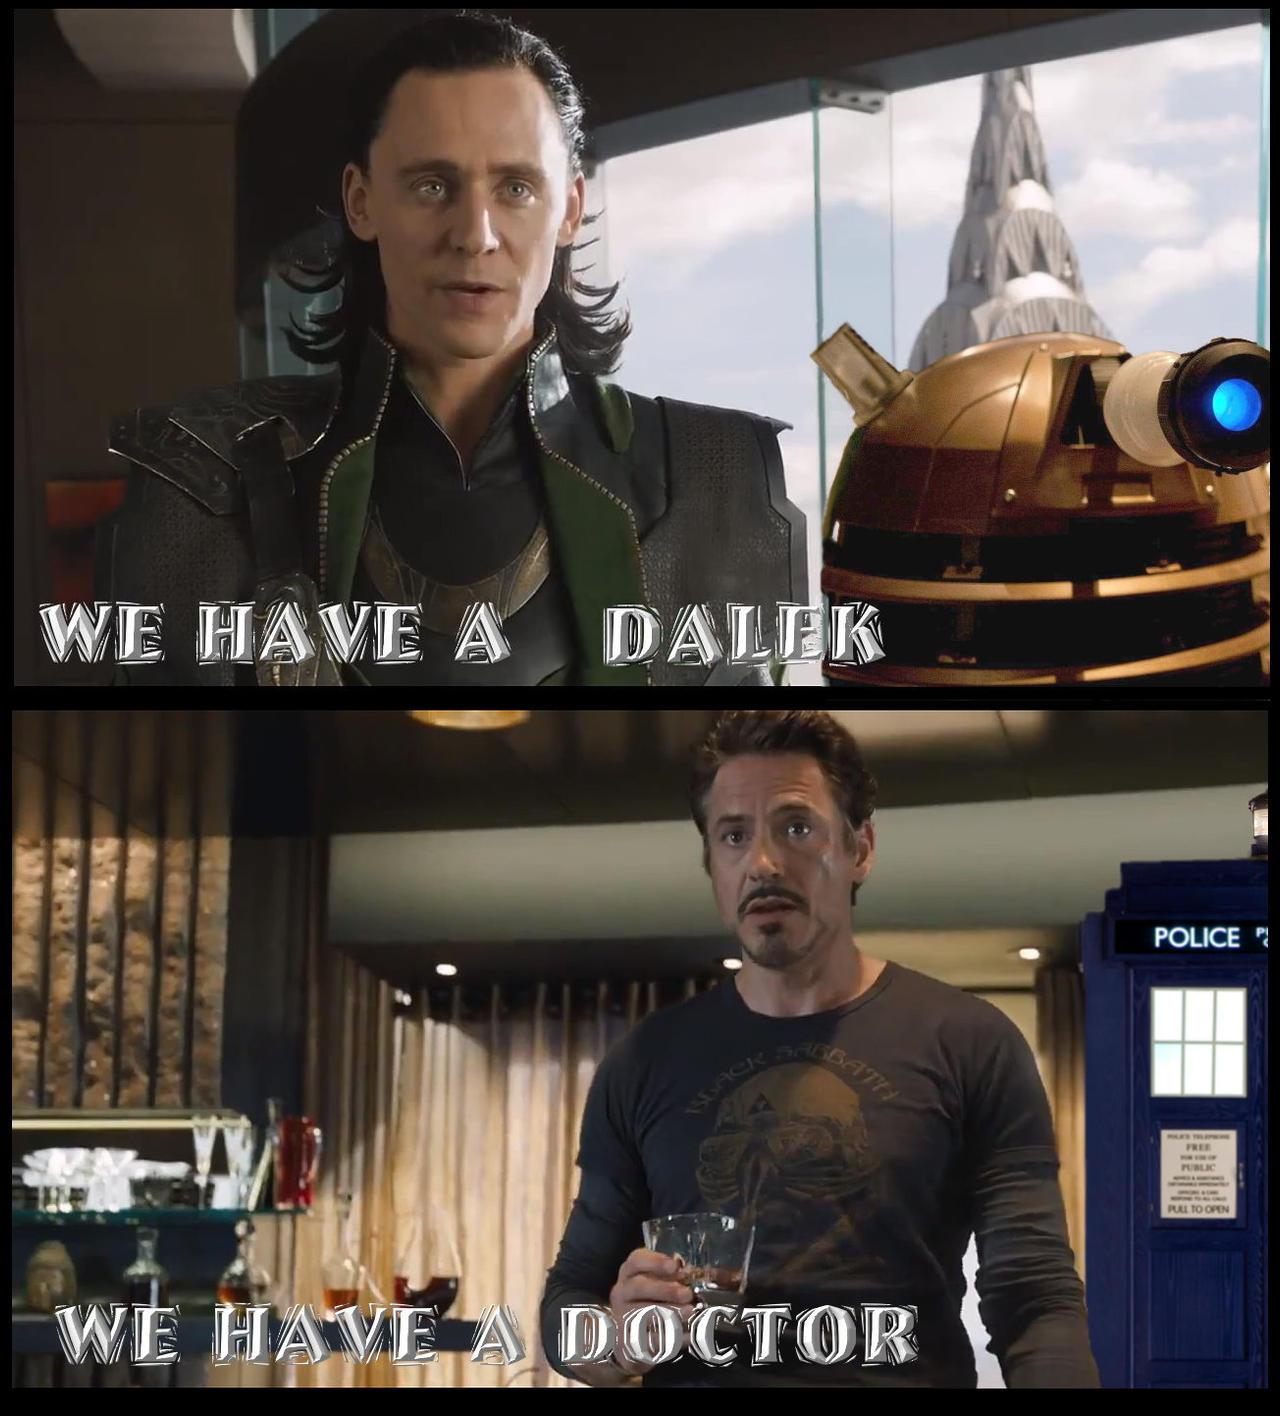 Humor - Page 5 Asylum_of_the_daleks_avengers_style_by_rocketman28-d61y9xn